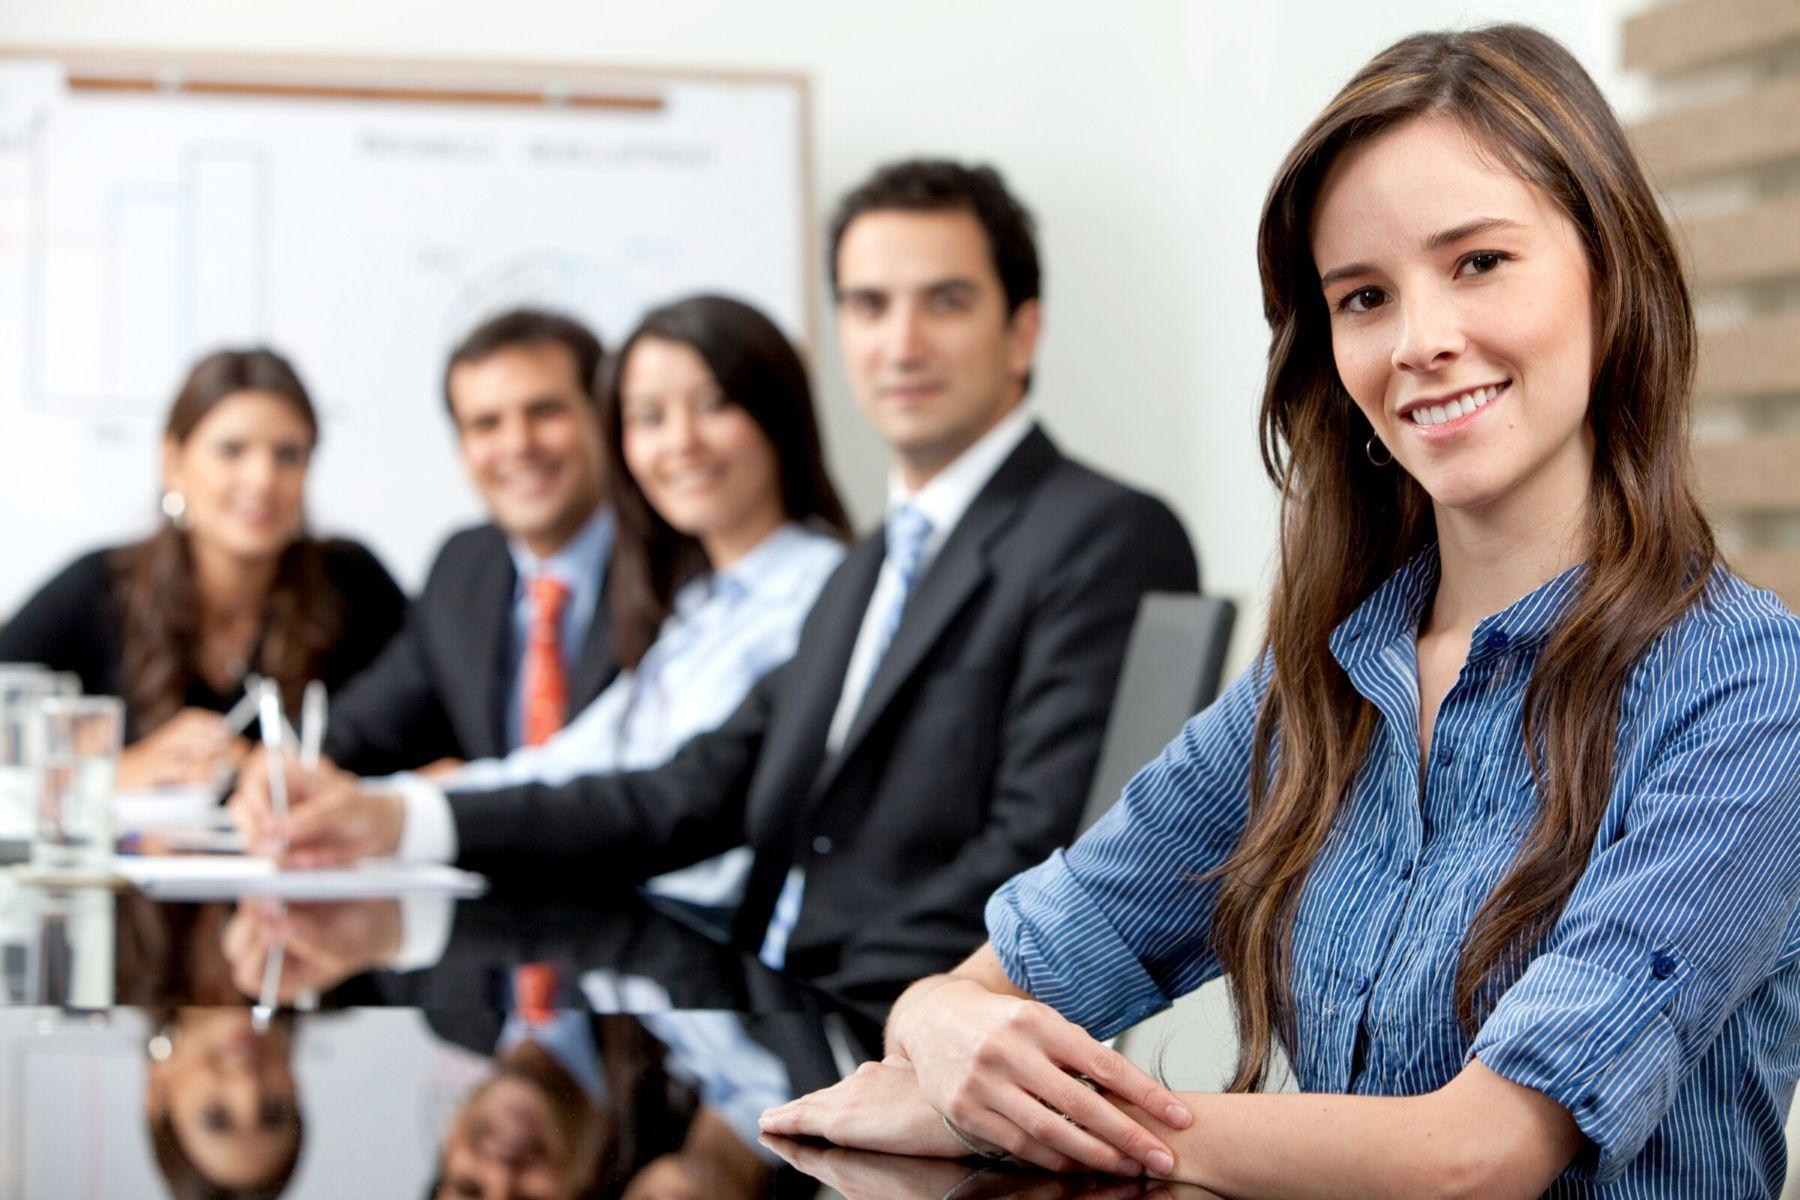 Human Resources Professionals